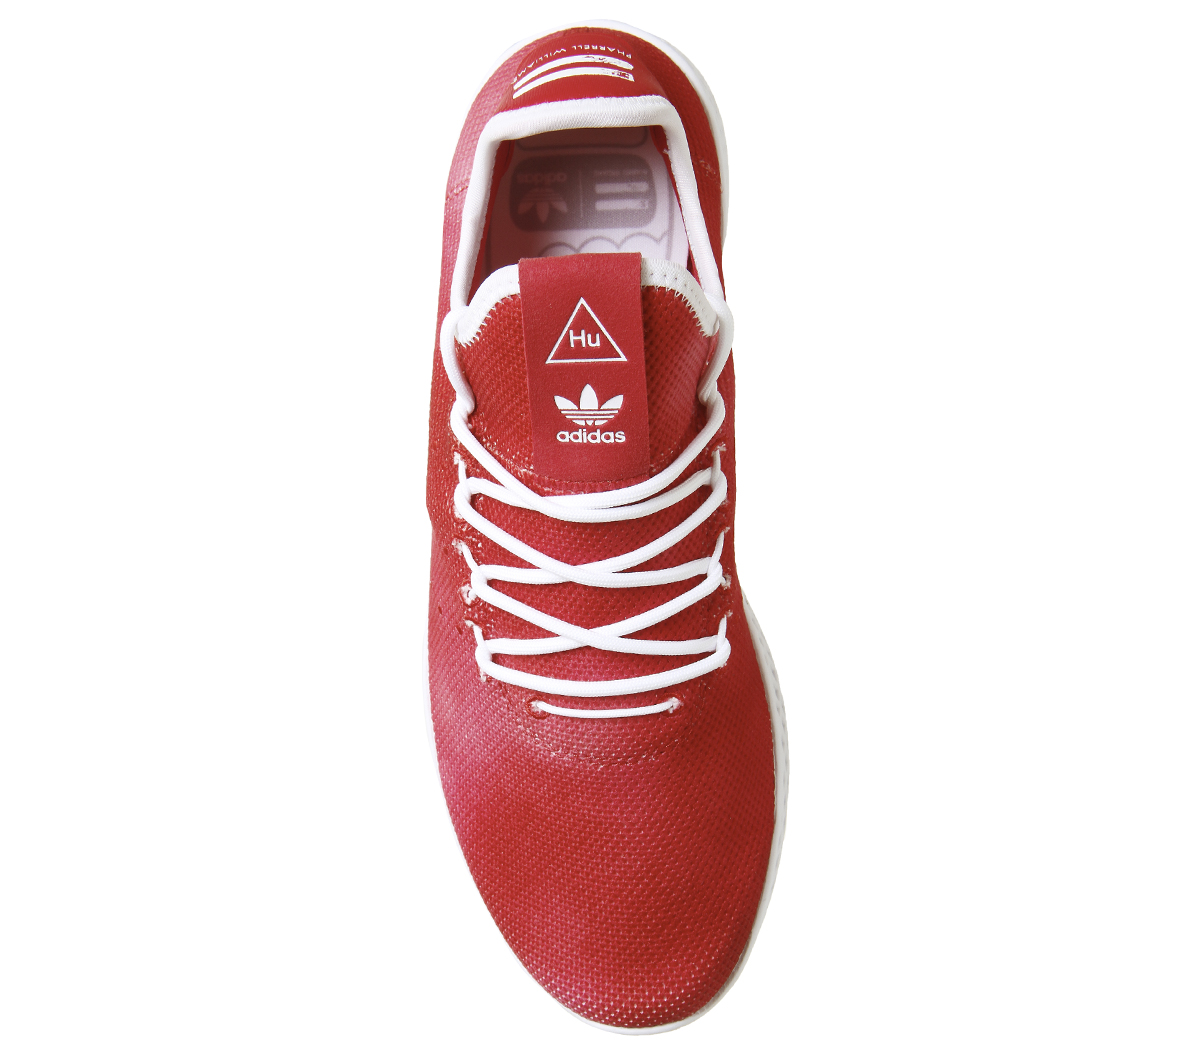 Da Da Da Uomo Adidas Pw Tennis   da ginnastica Scarlet Bianco   Da Ginnastica Bianco 779218